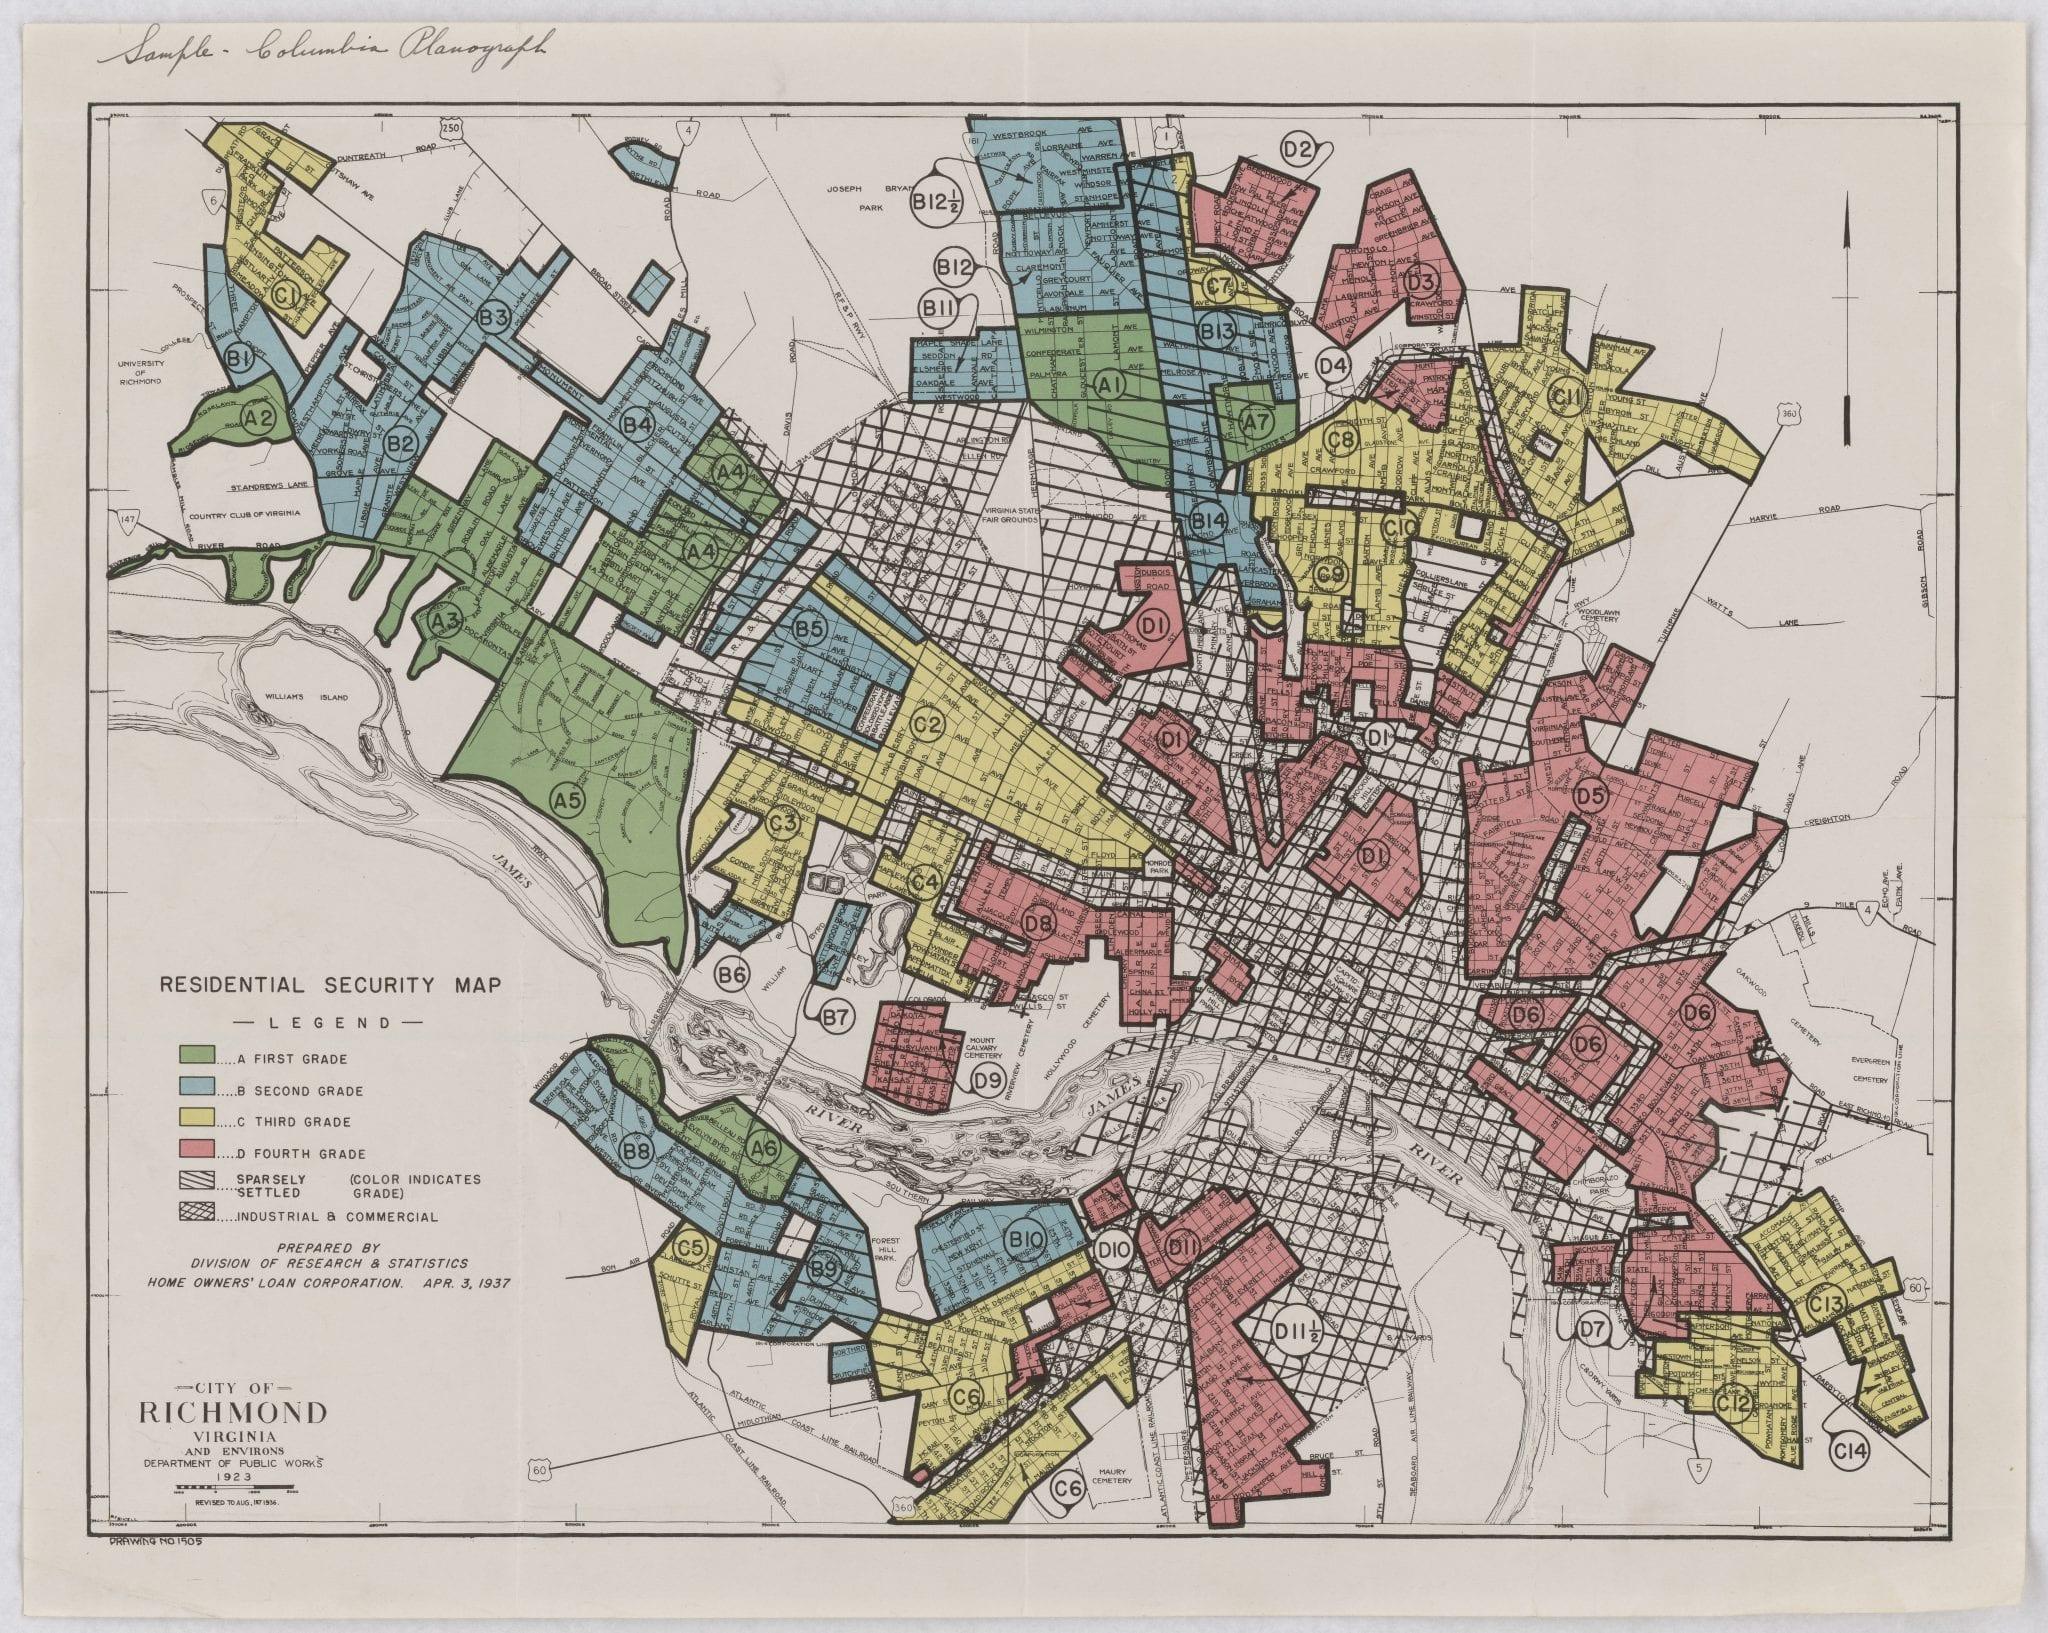 Redlined map of Richmond, VA